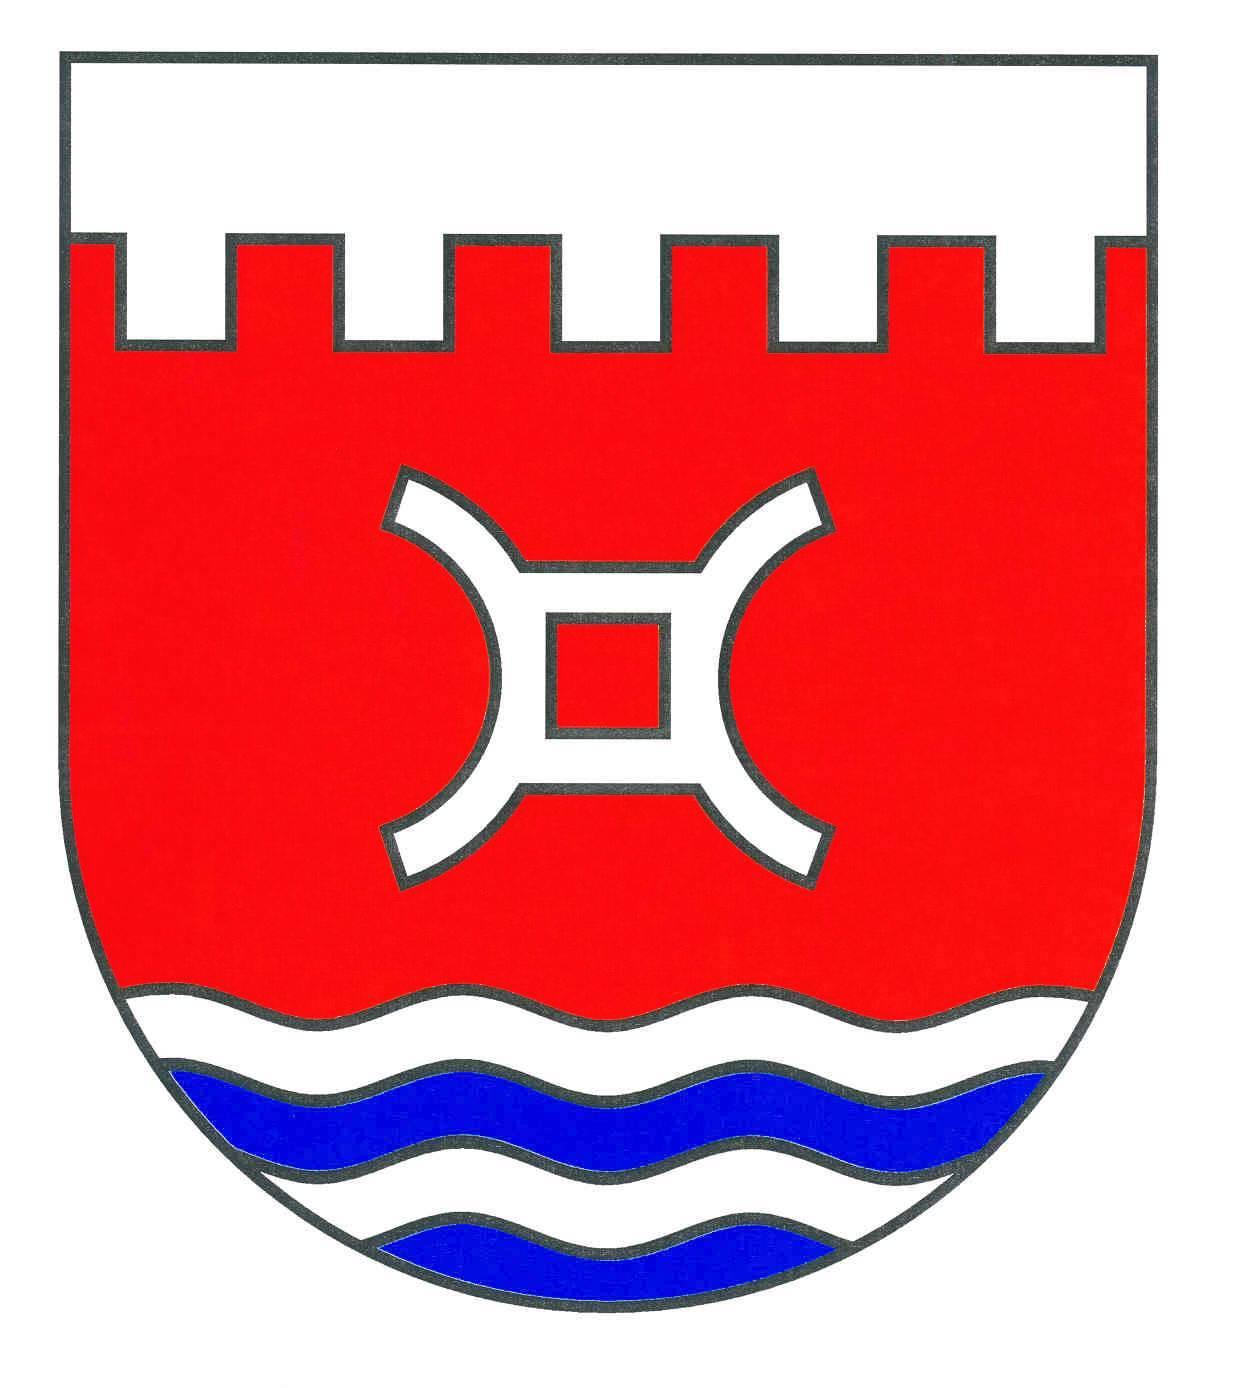 Wappen GemeindeQuarnbek, Kreis Rendsburg-Eckernförde